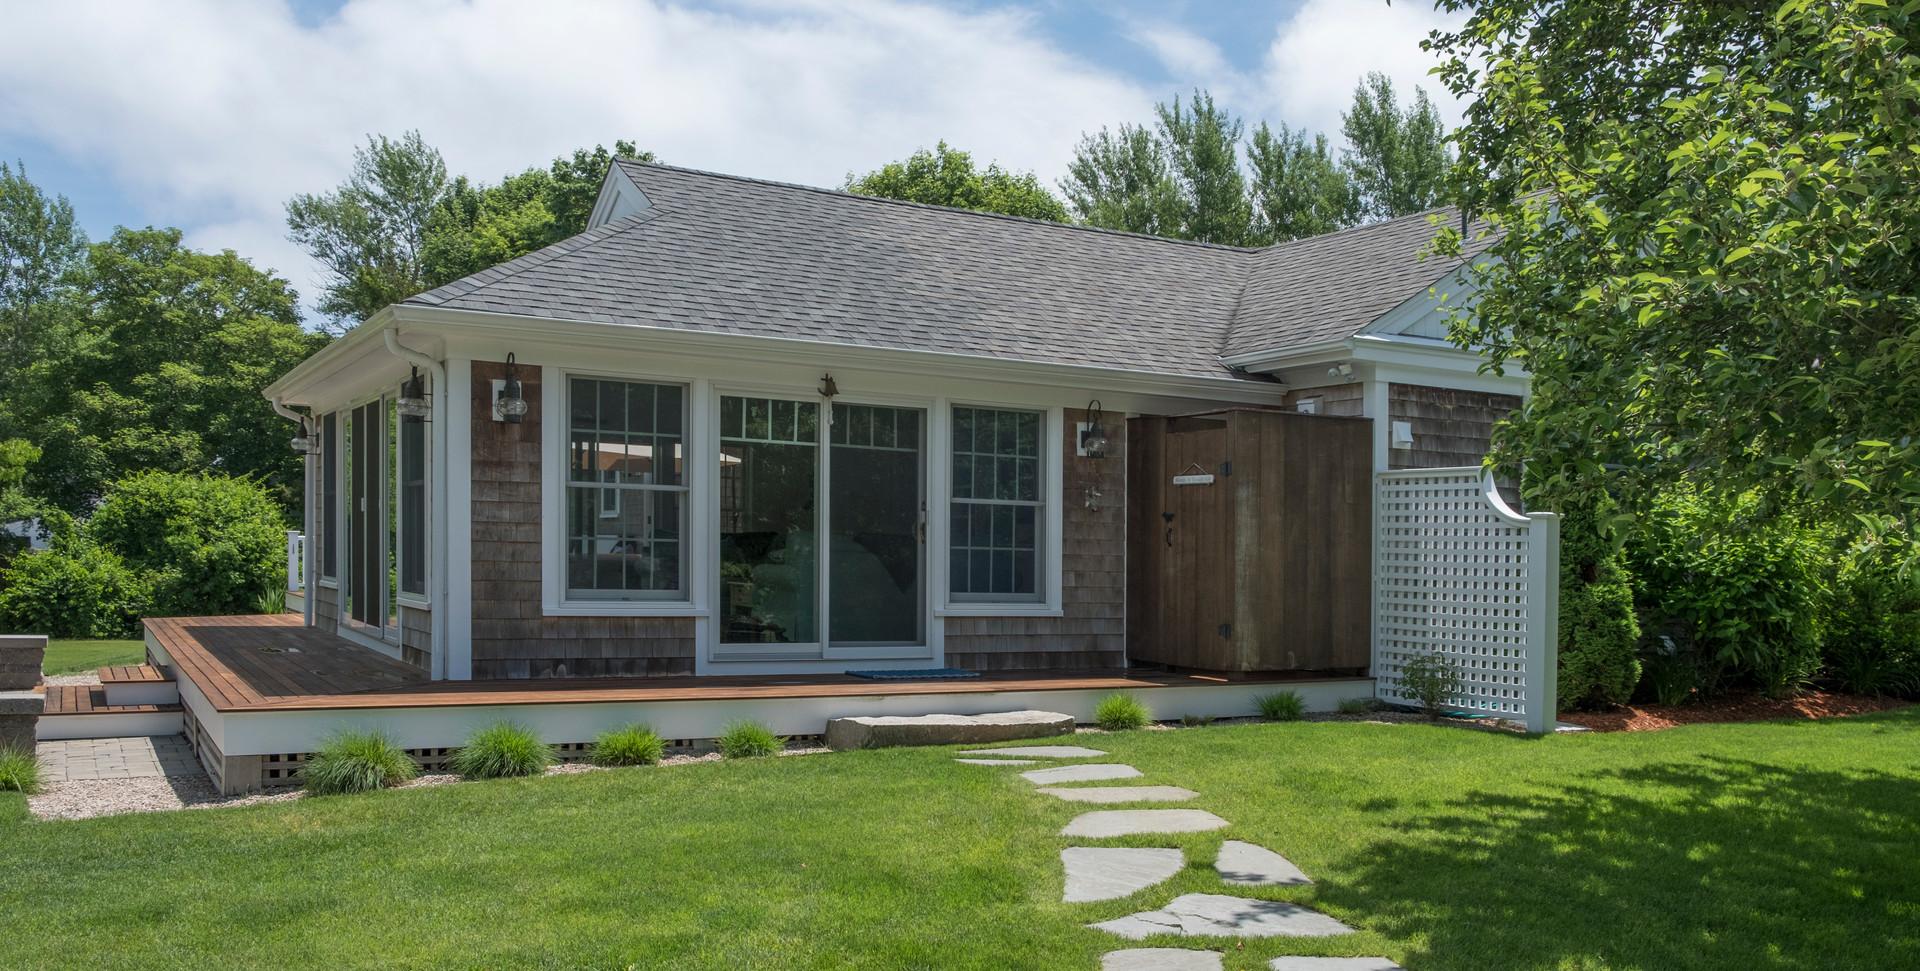 Cape Cod Renovated Home, Four Seasons Room